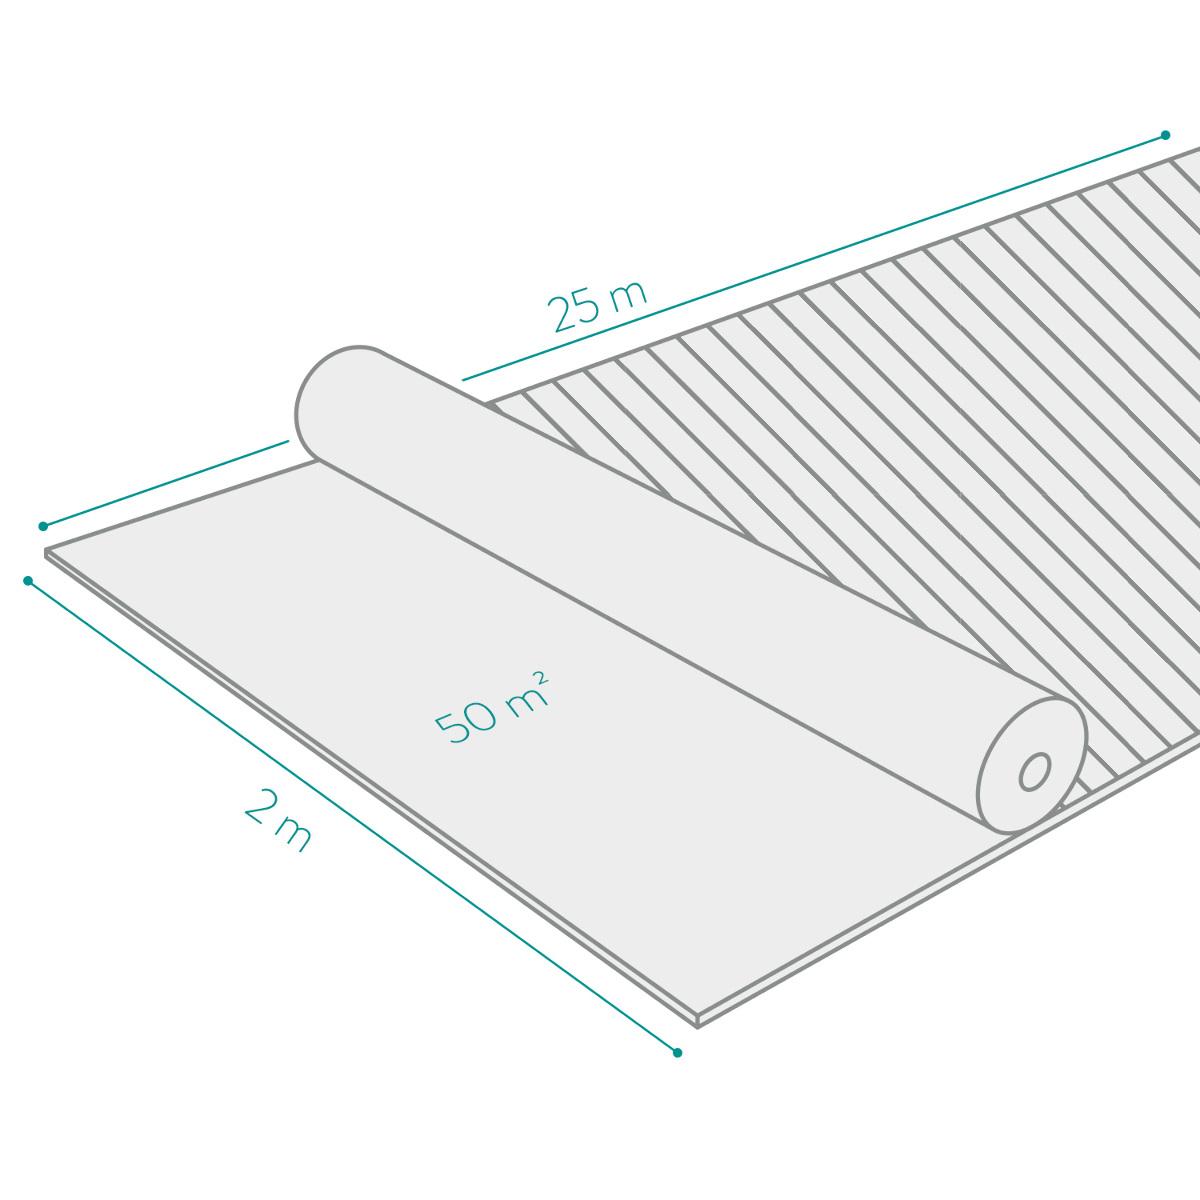 Unkrautvlies Folie 50m² wasserdurchlässig UV-stabil 100g ...